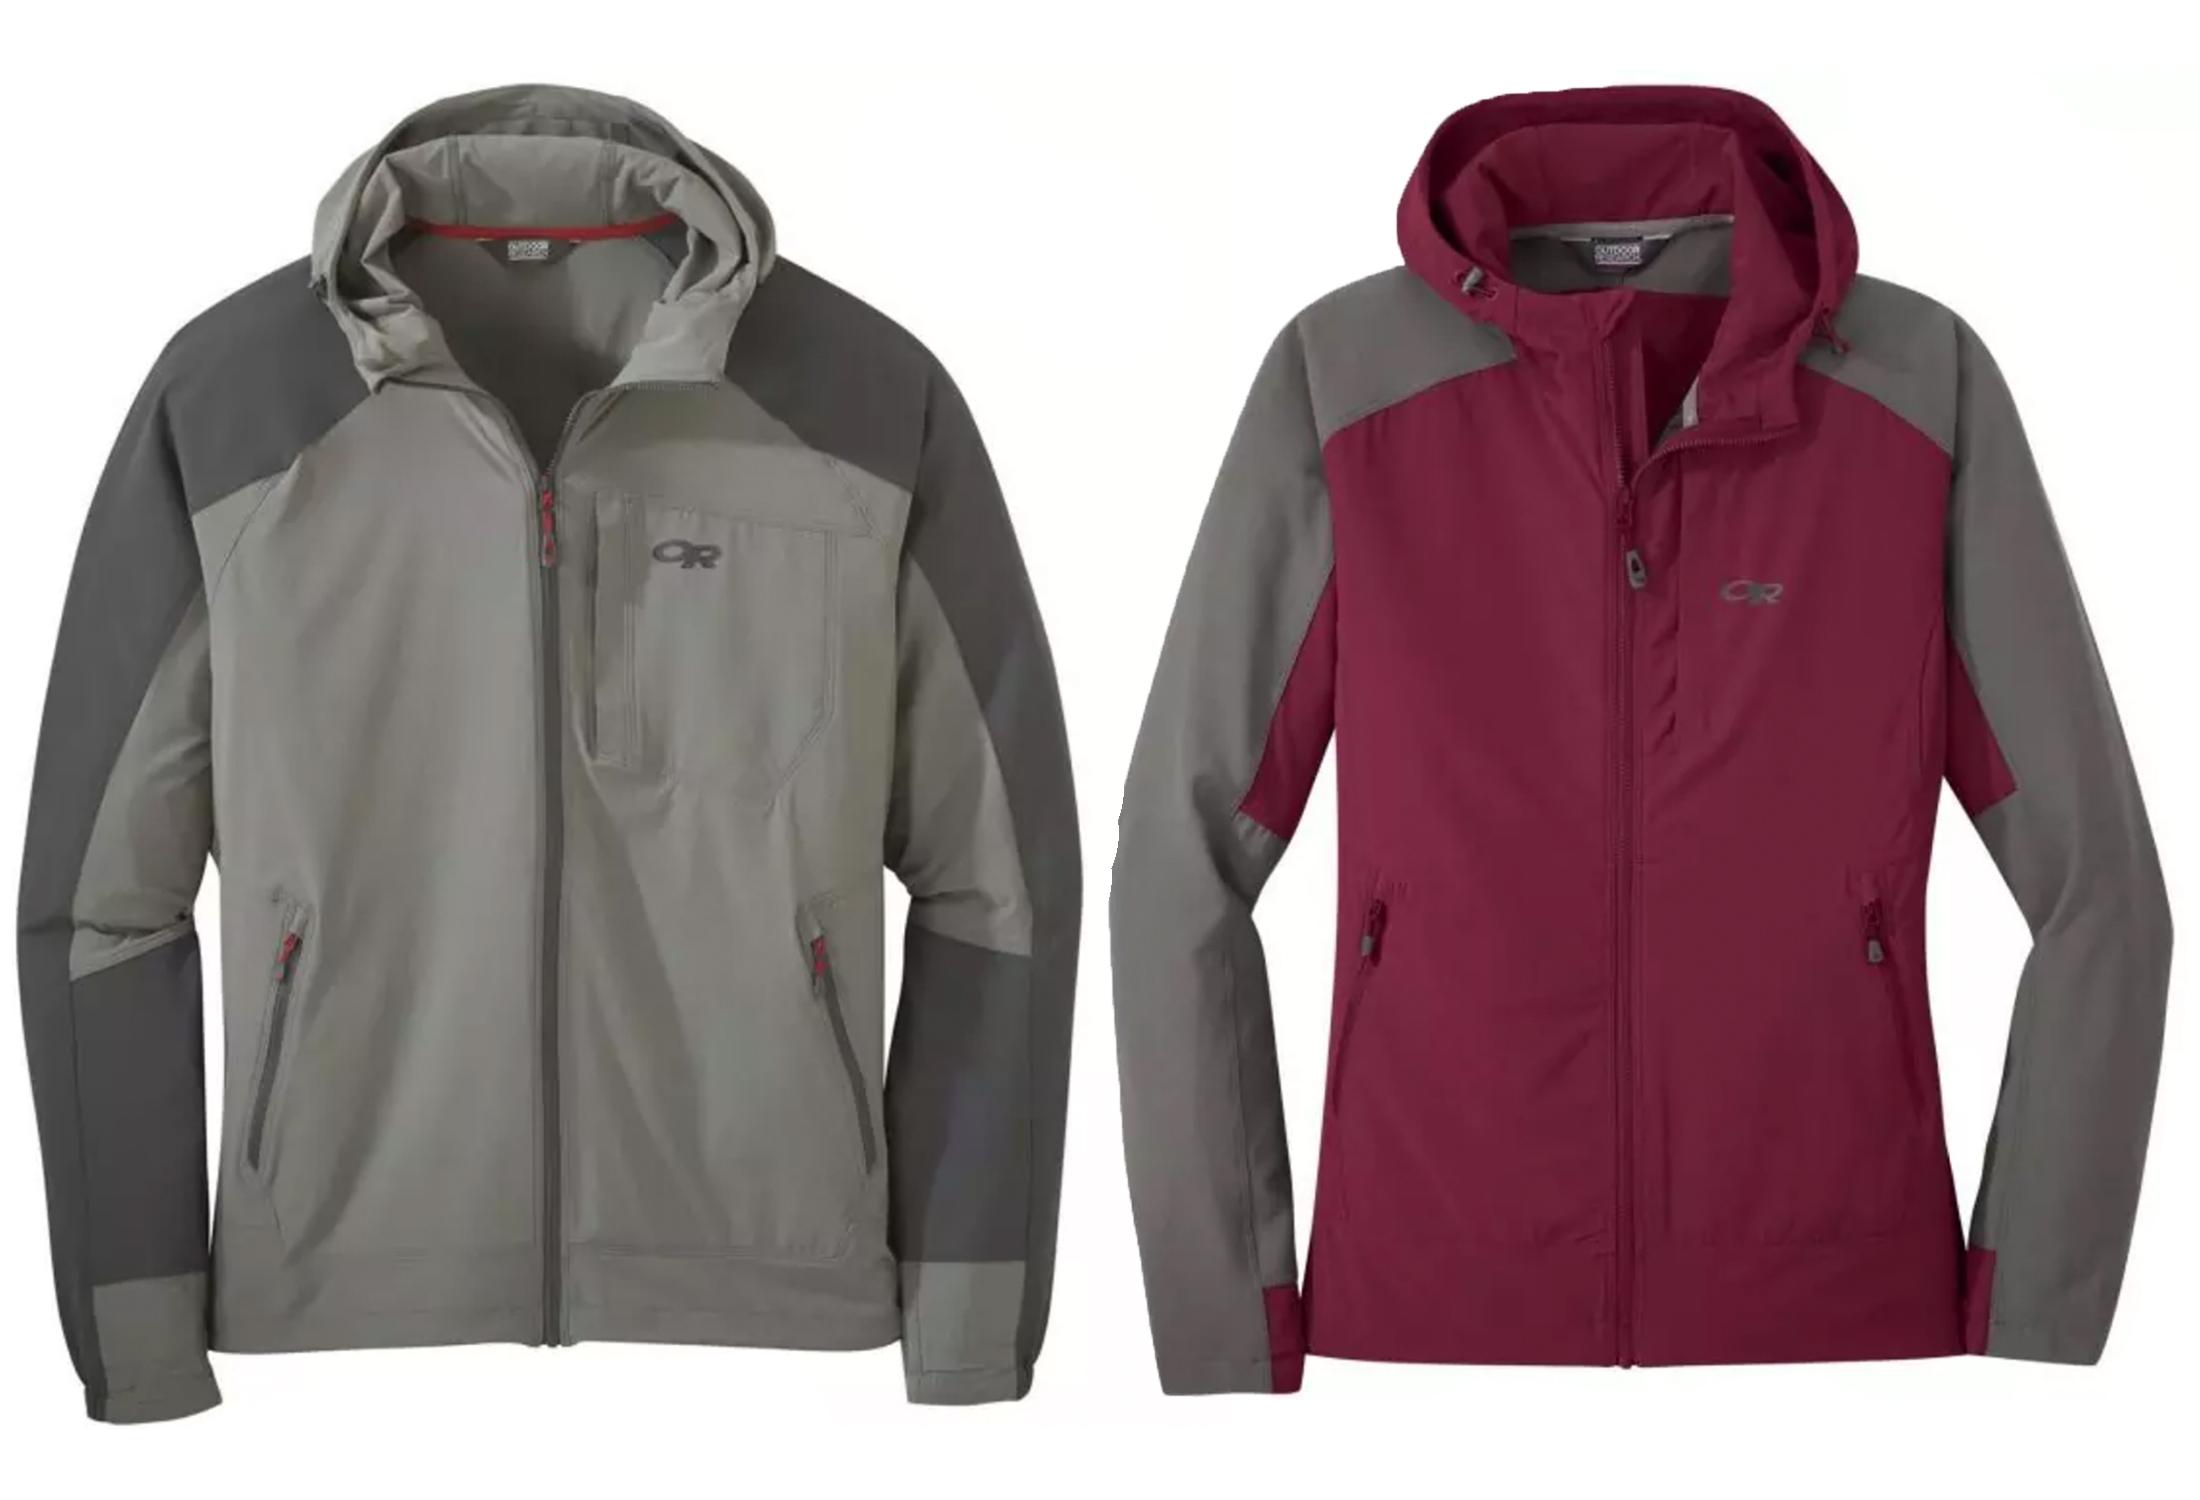 OR hooded ferrosi jacket